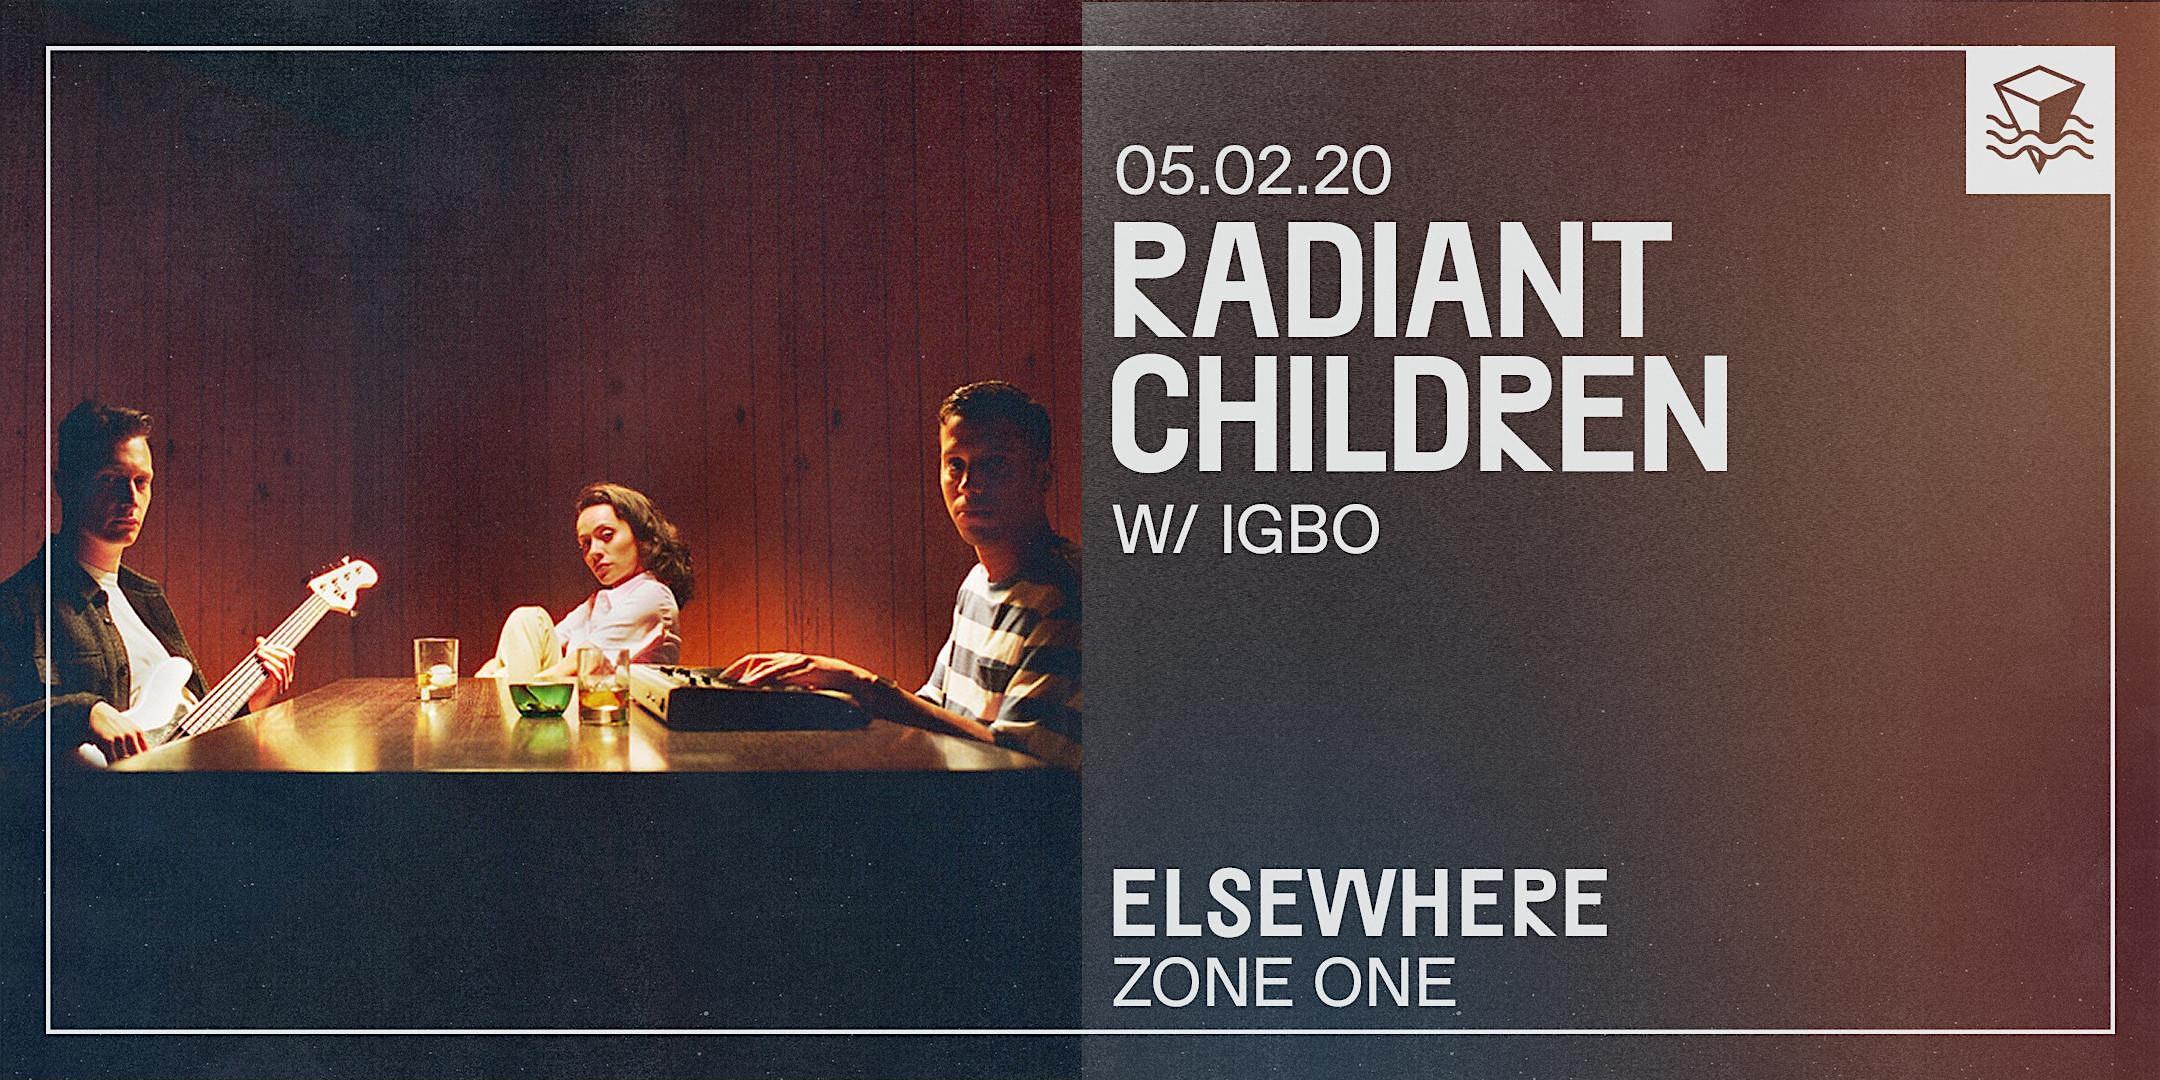 Radiant Children